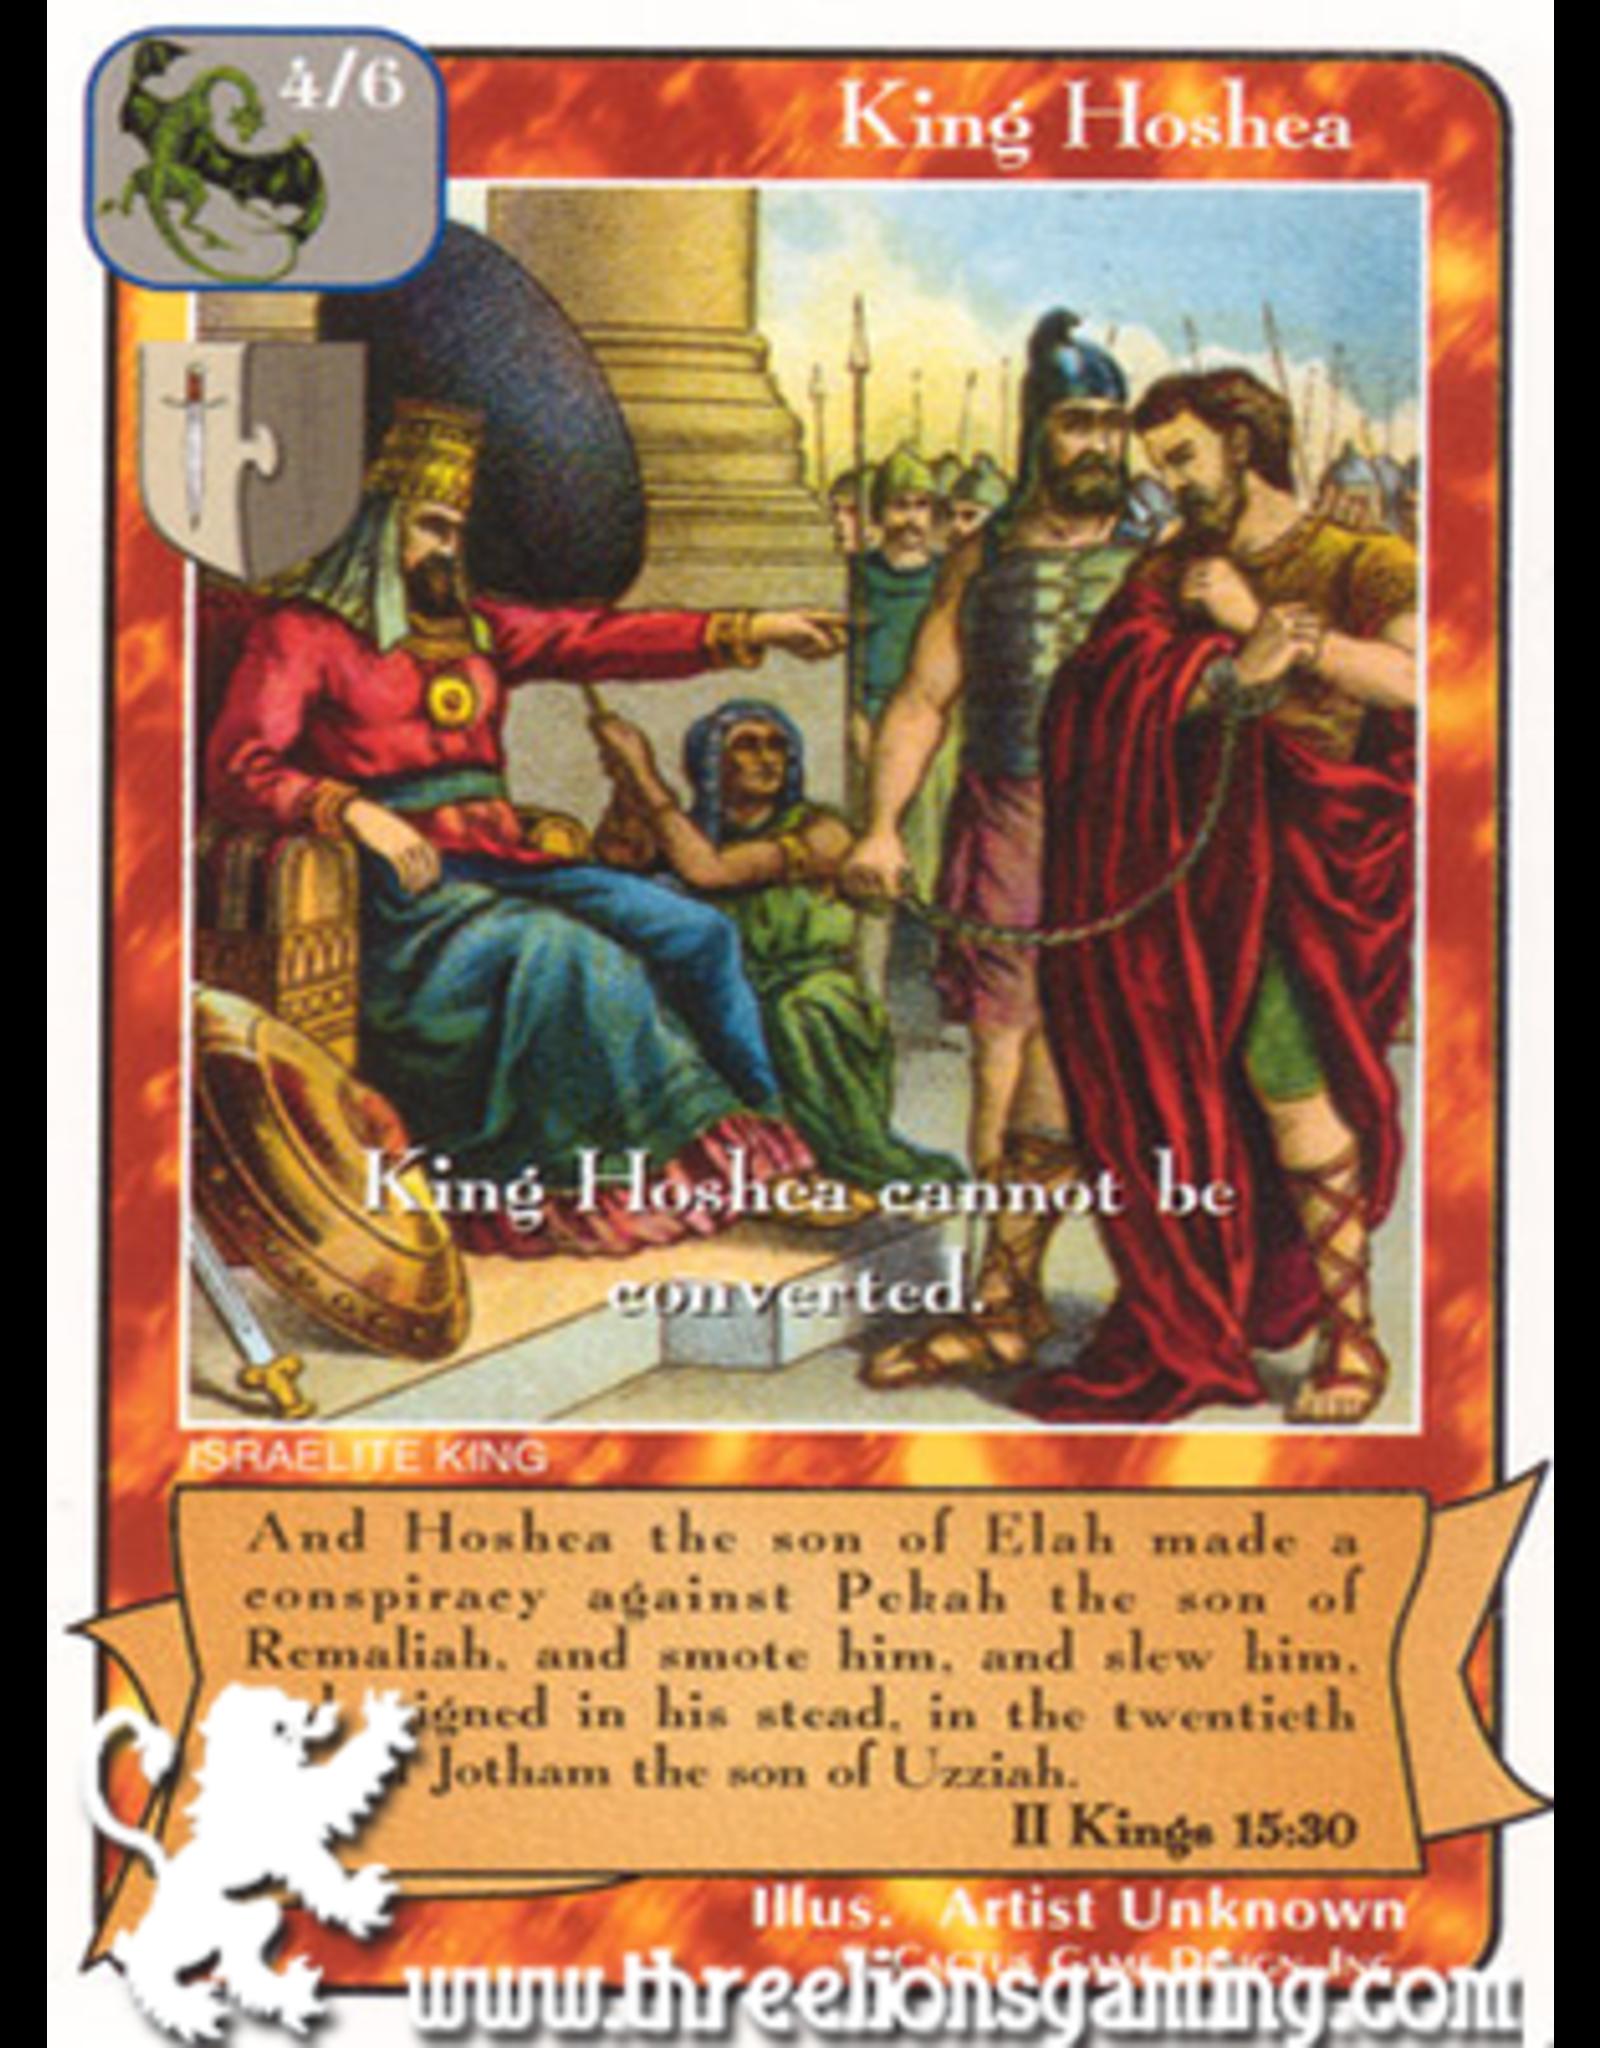 Ki: King Hoshea